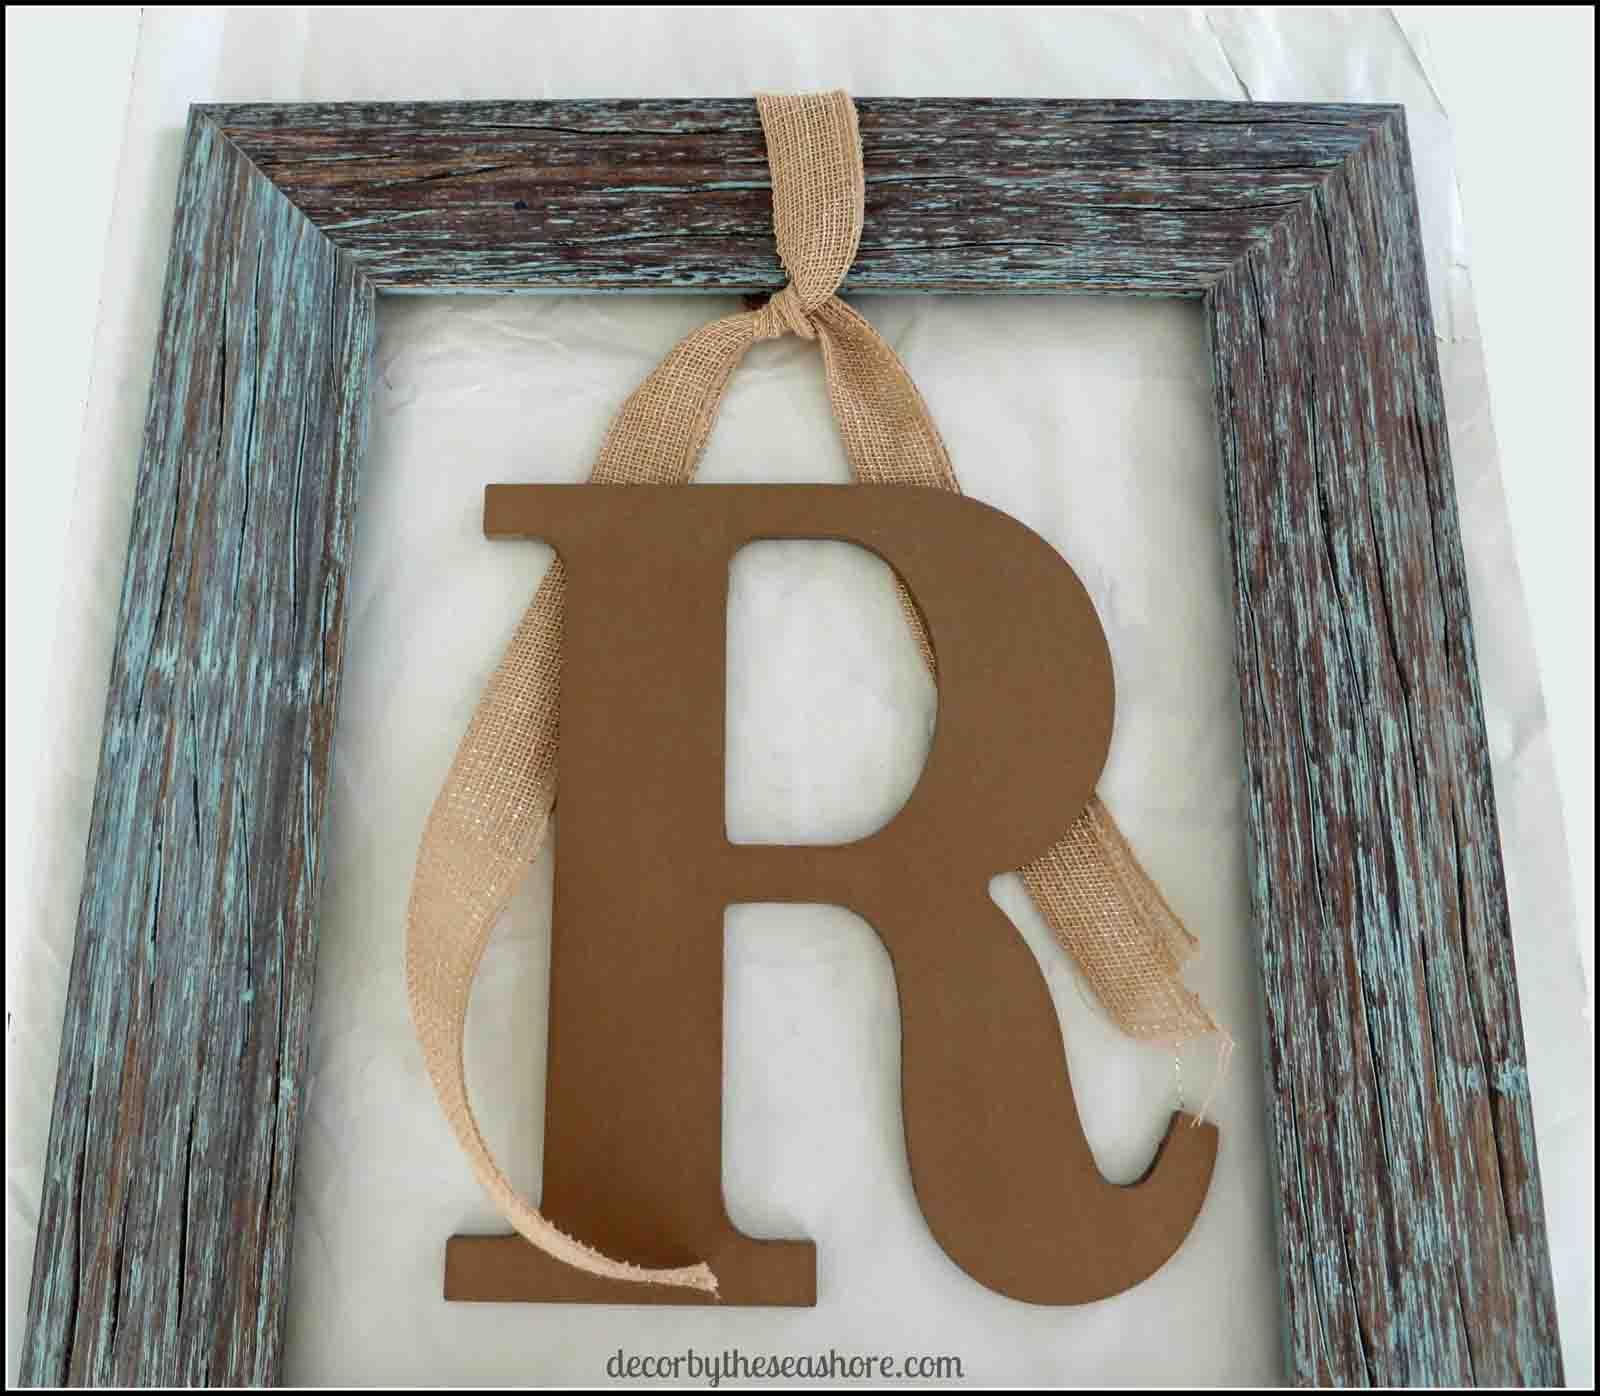 Framed Monogram Ribbon- Decor by the Seashore